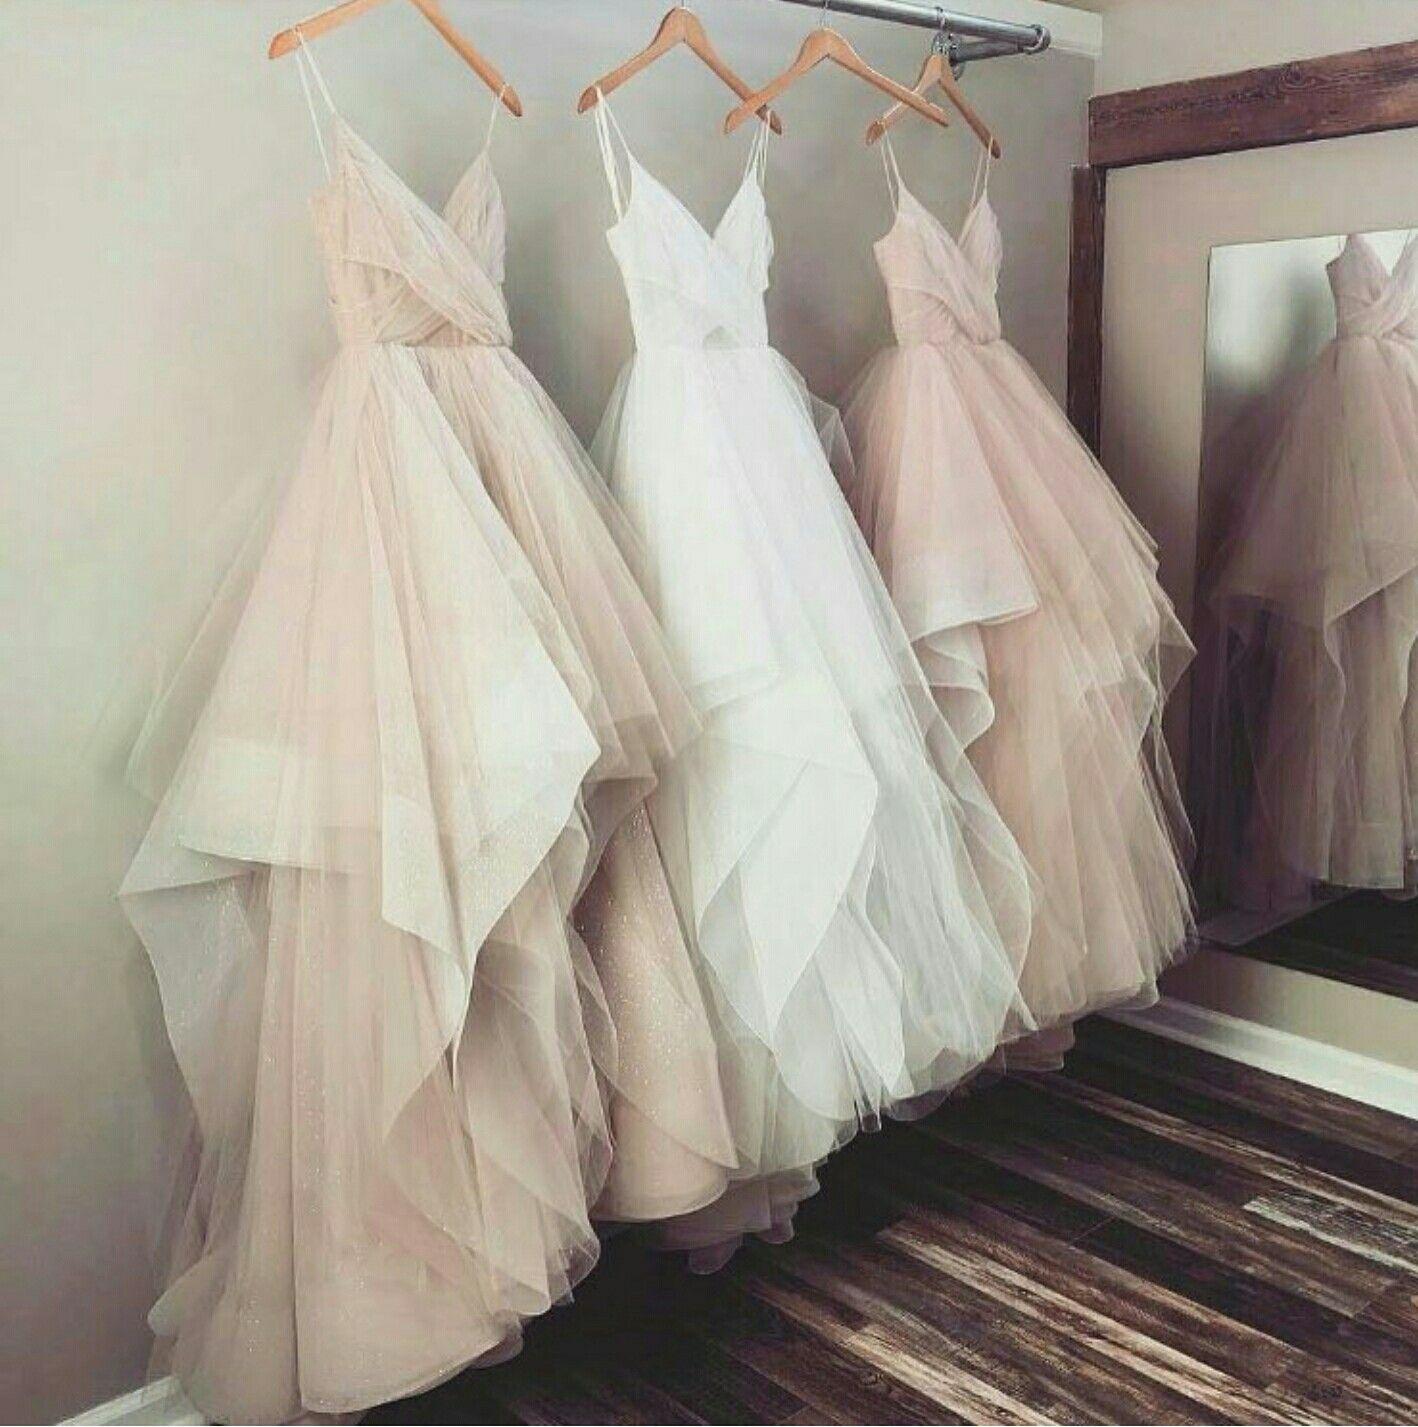 Girls wedding dress  Pin by Anastasia Postnikova on wedding dress  Pinterest  Wedding